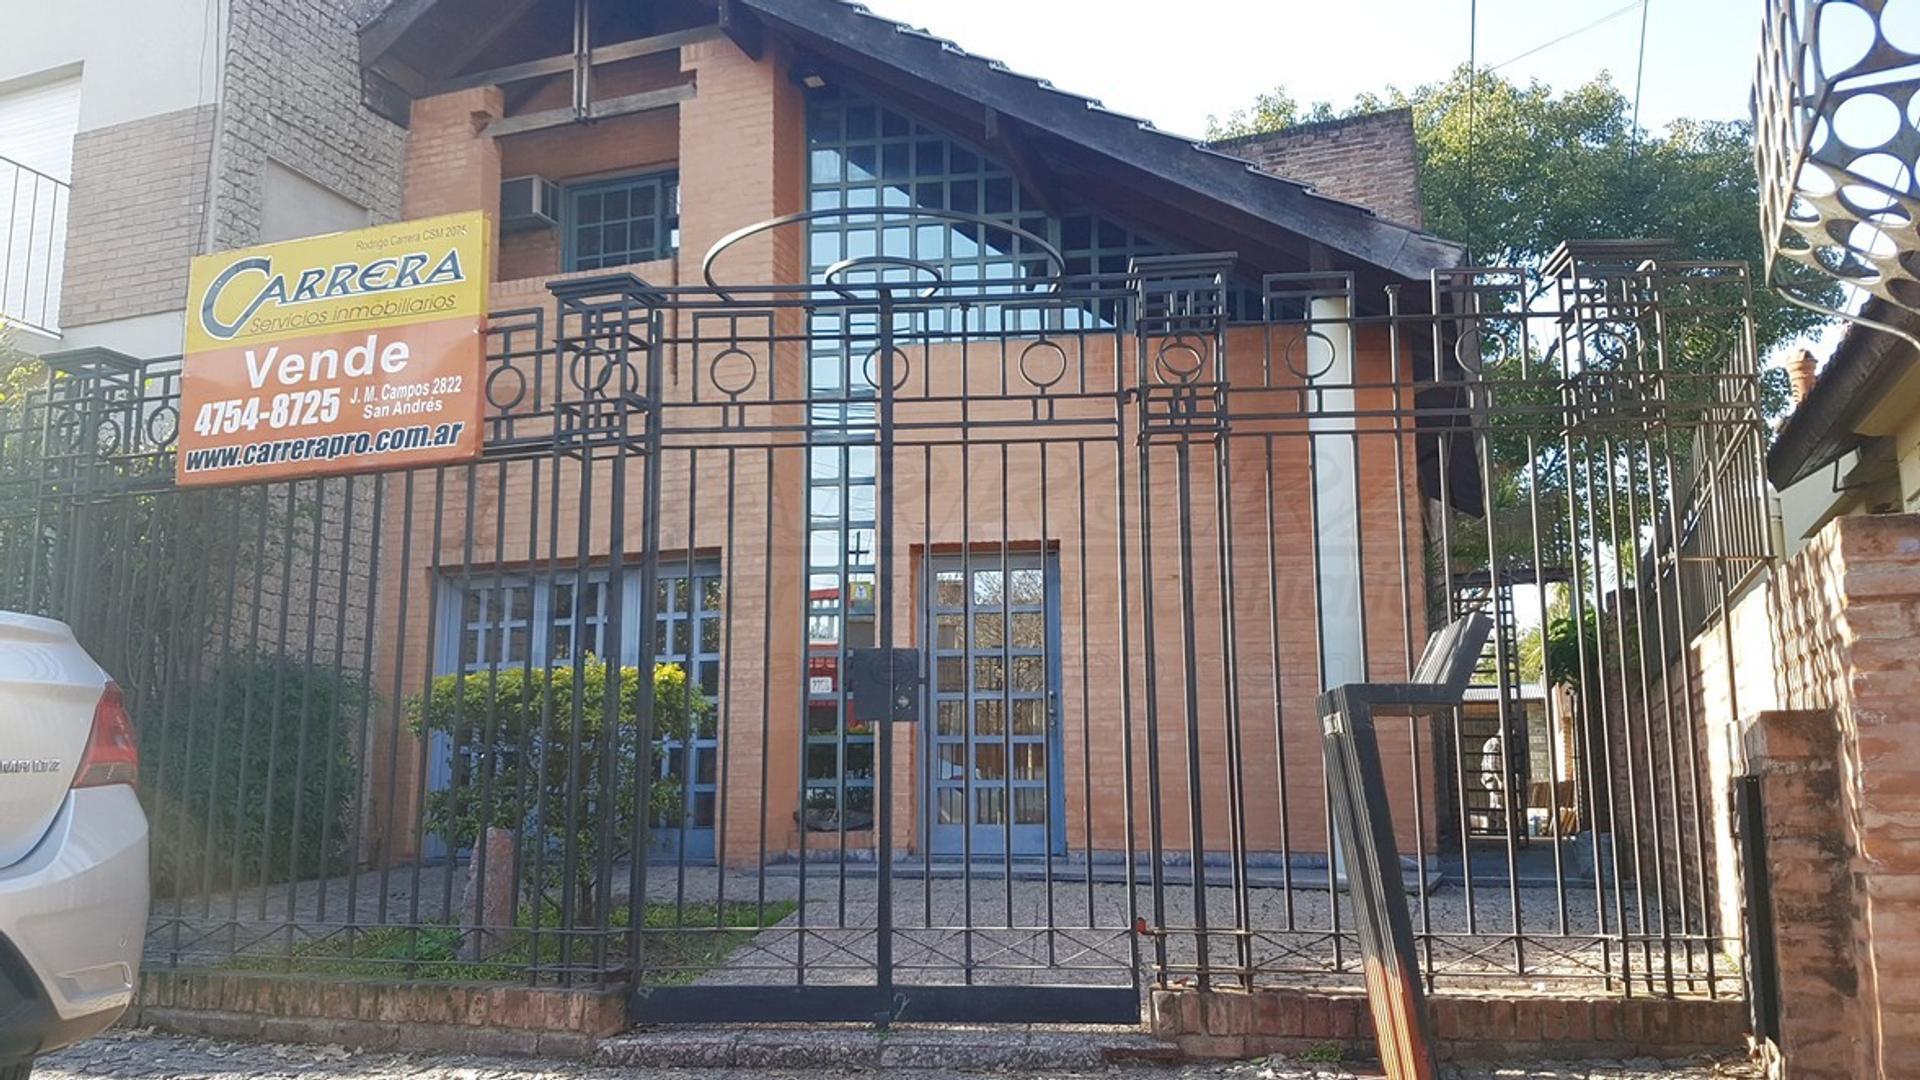 VENTA CASA 4 amb - en San Andres, Pcia de BSAS – www.carreraprop.com.ar  - tasamos HOY